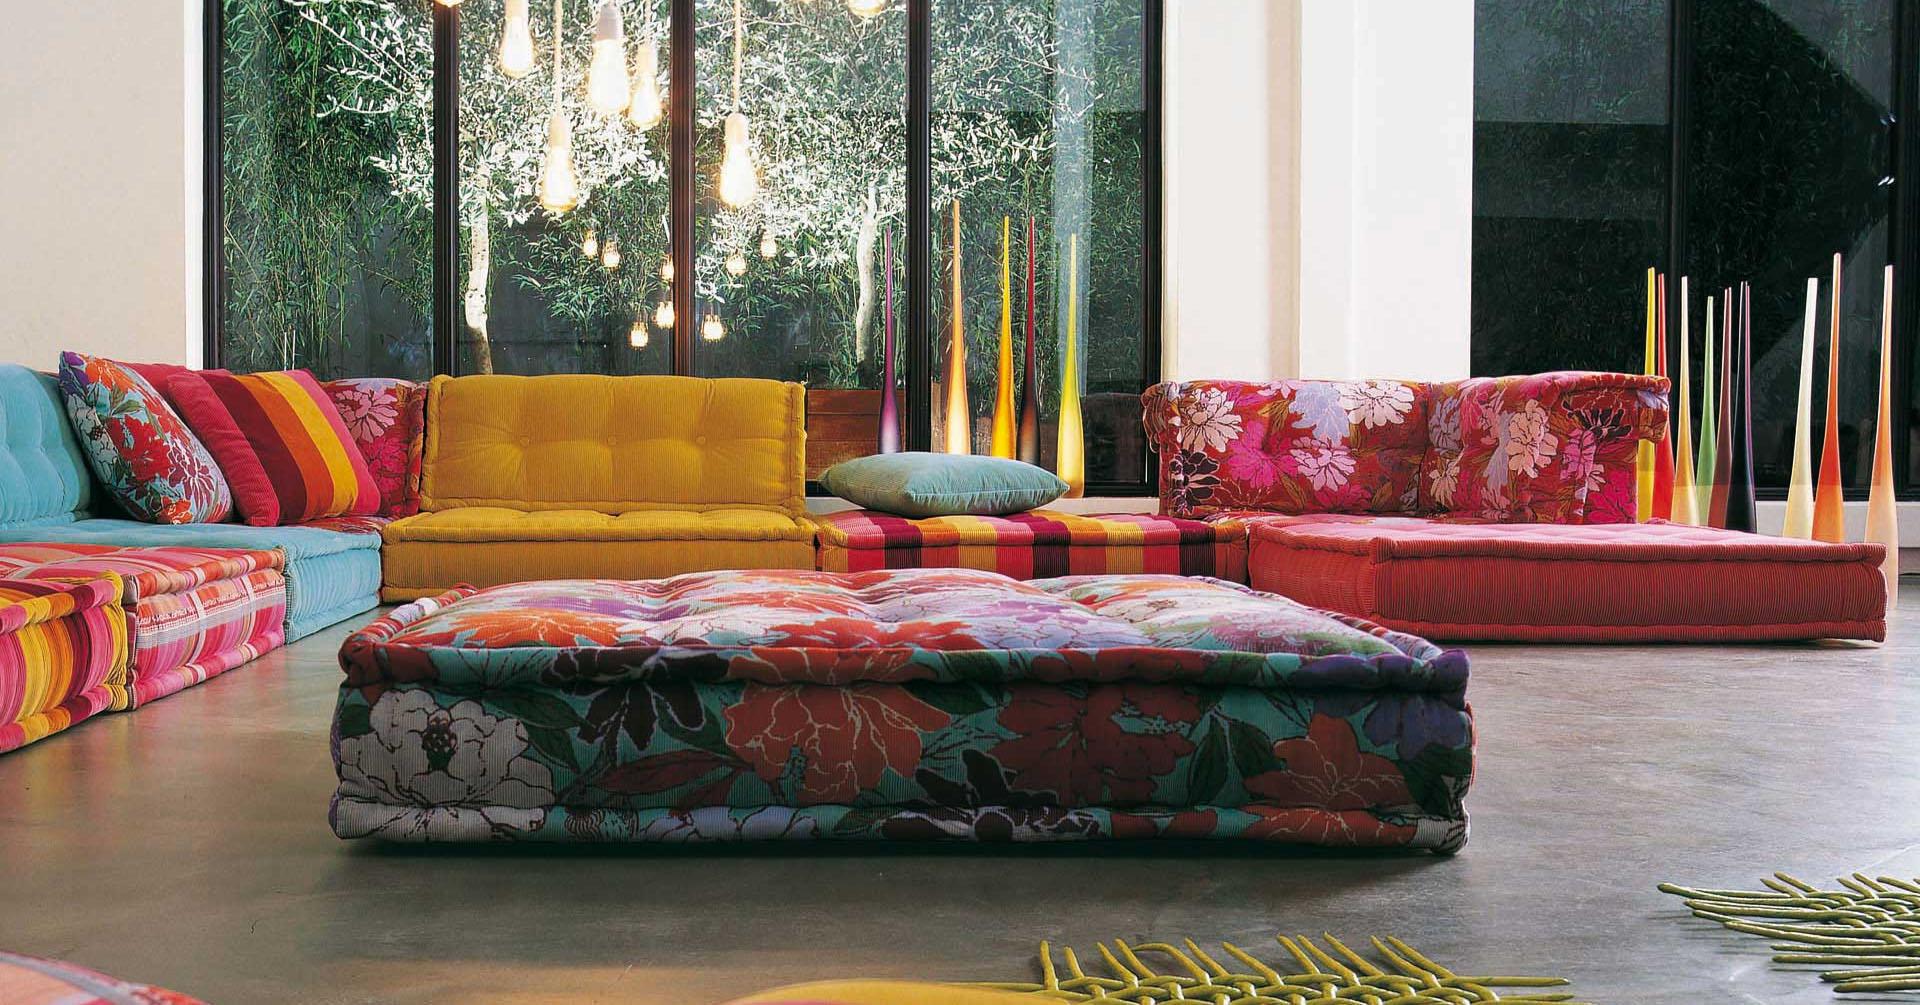 mah jong modular sofa preis sport design and wool day 4 mattress making